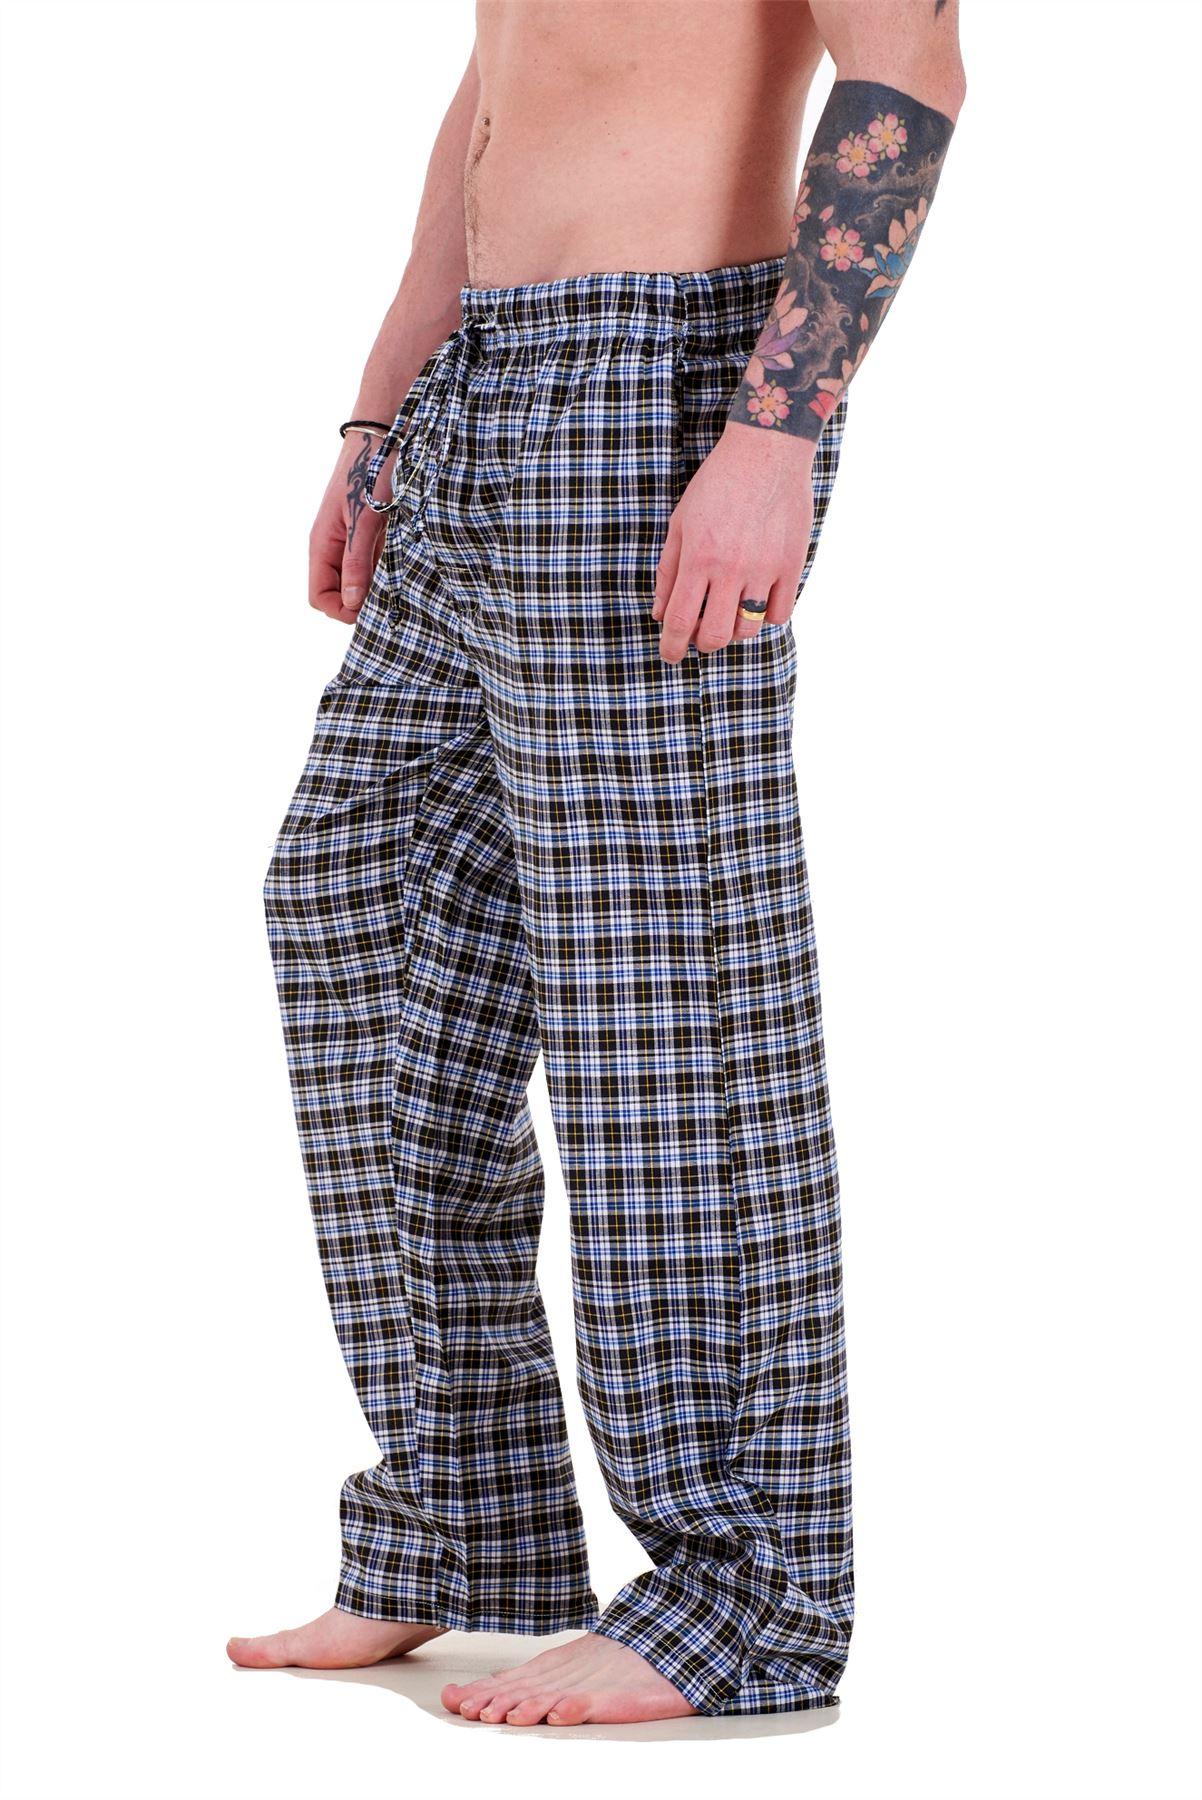 Mens-Pyjama-Bottoms-Rich-Cotton-Woven-Check-Lounge-Pant-Nightwear-Big-3XL-to-5XL Indexbild 5